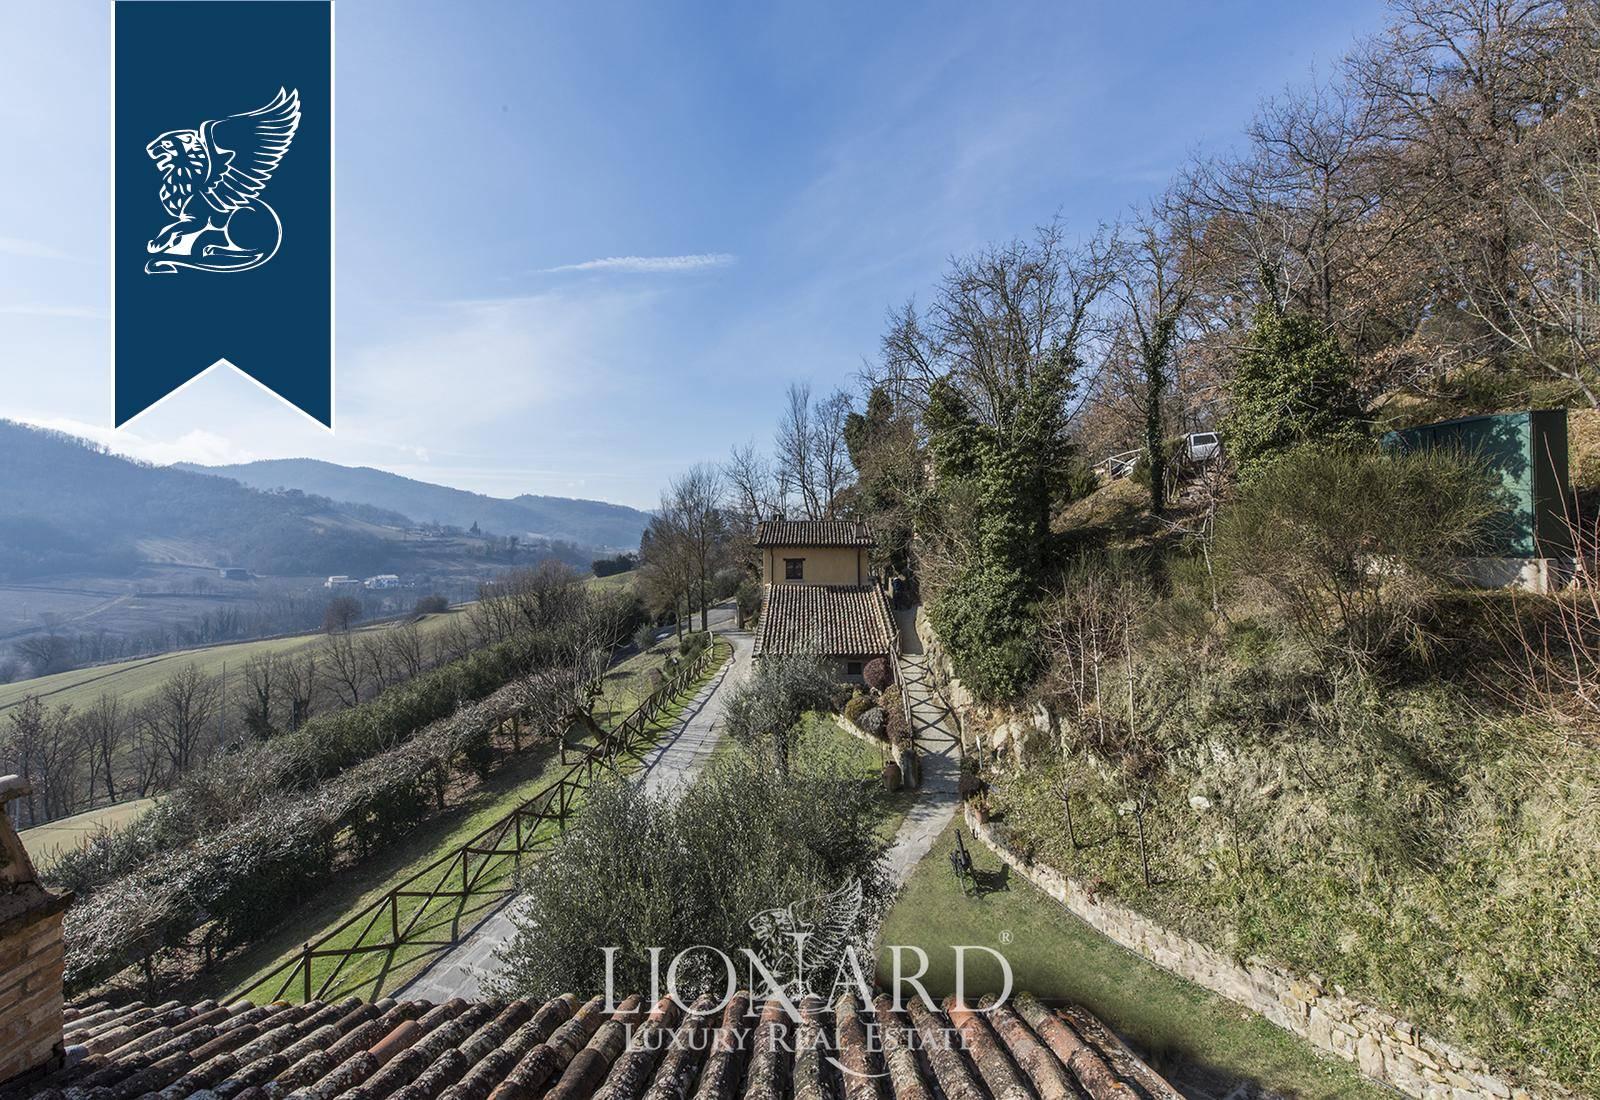 Agriturismo in Vendita a Citta' Di Castello: 0 locali, 1500 mq - Foto 7